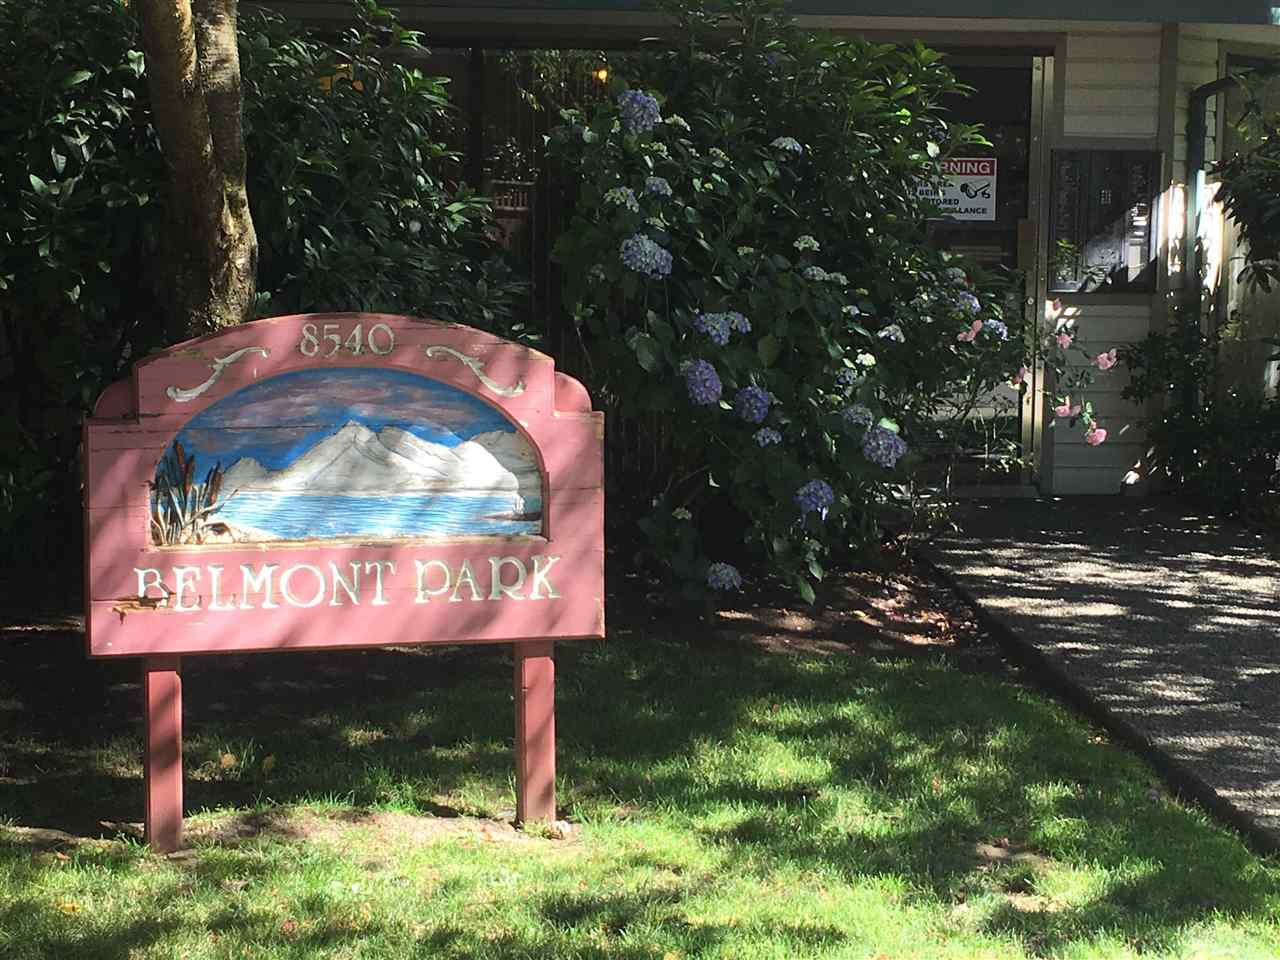 Main Photo: 308 8540 CITATION Drive in Richmond: Brighouse Condo for sale : MLS®# R2284755